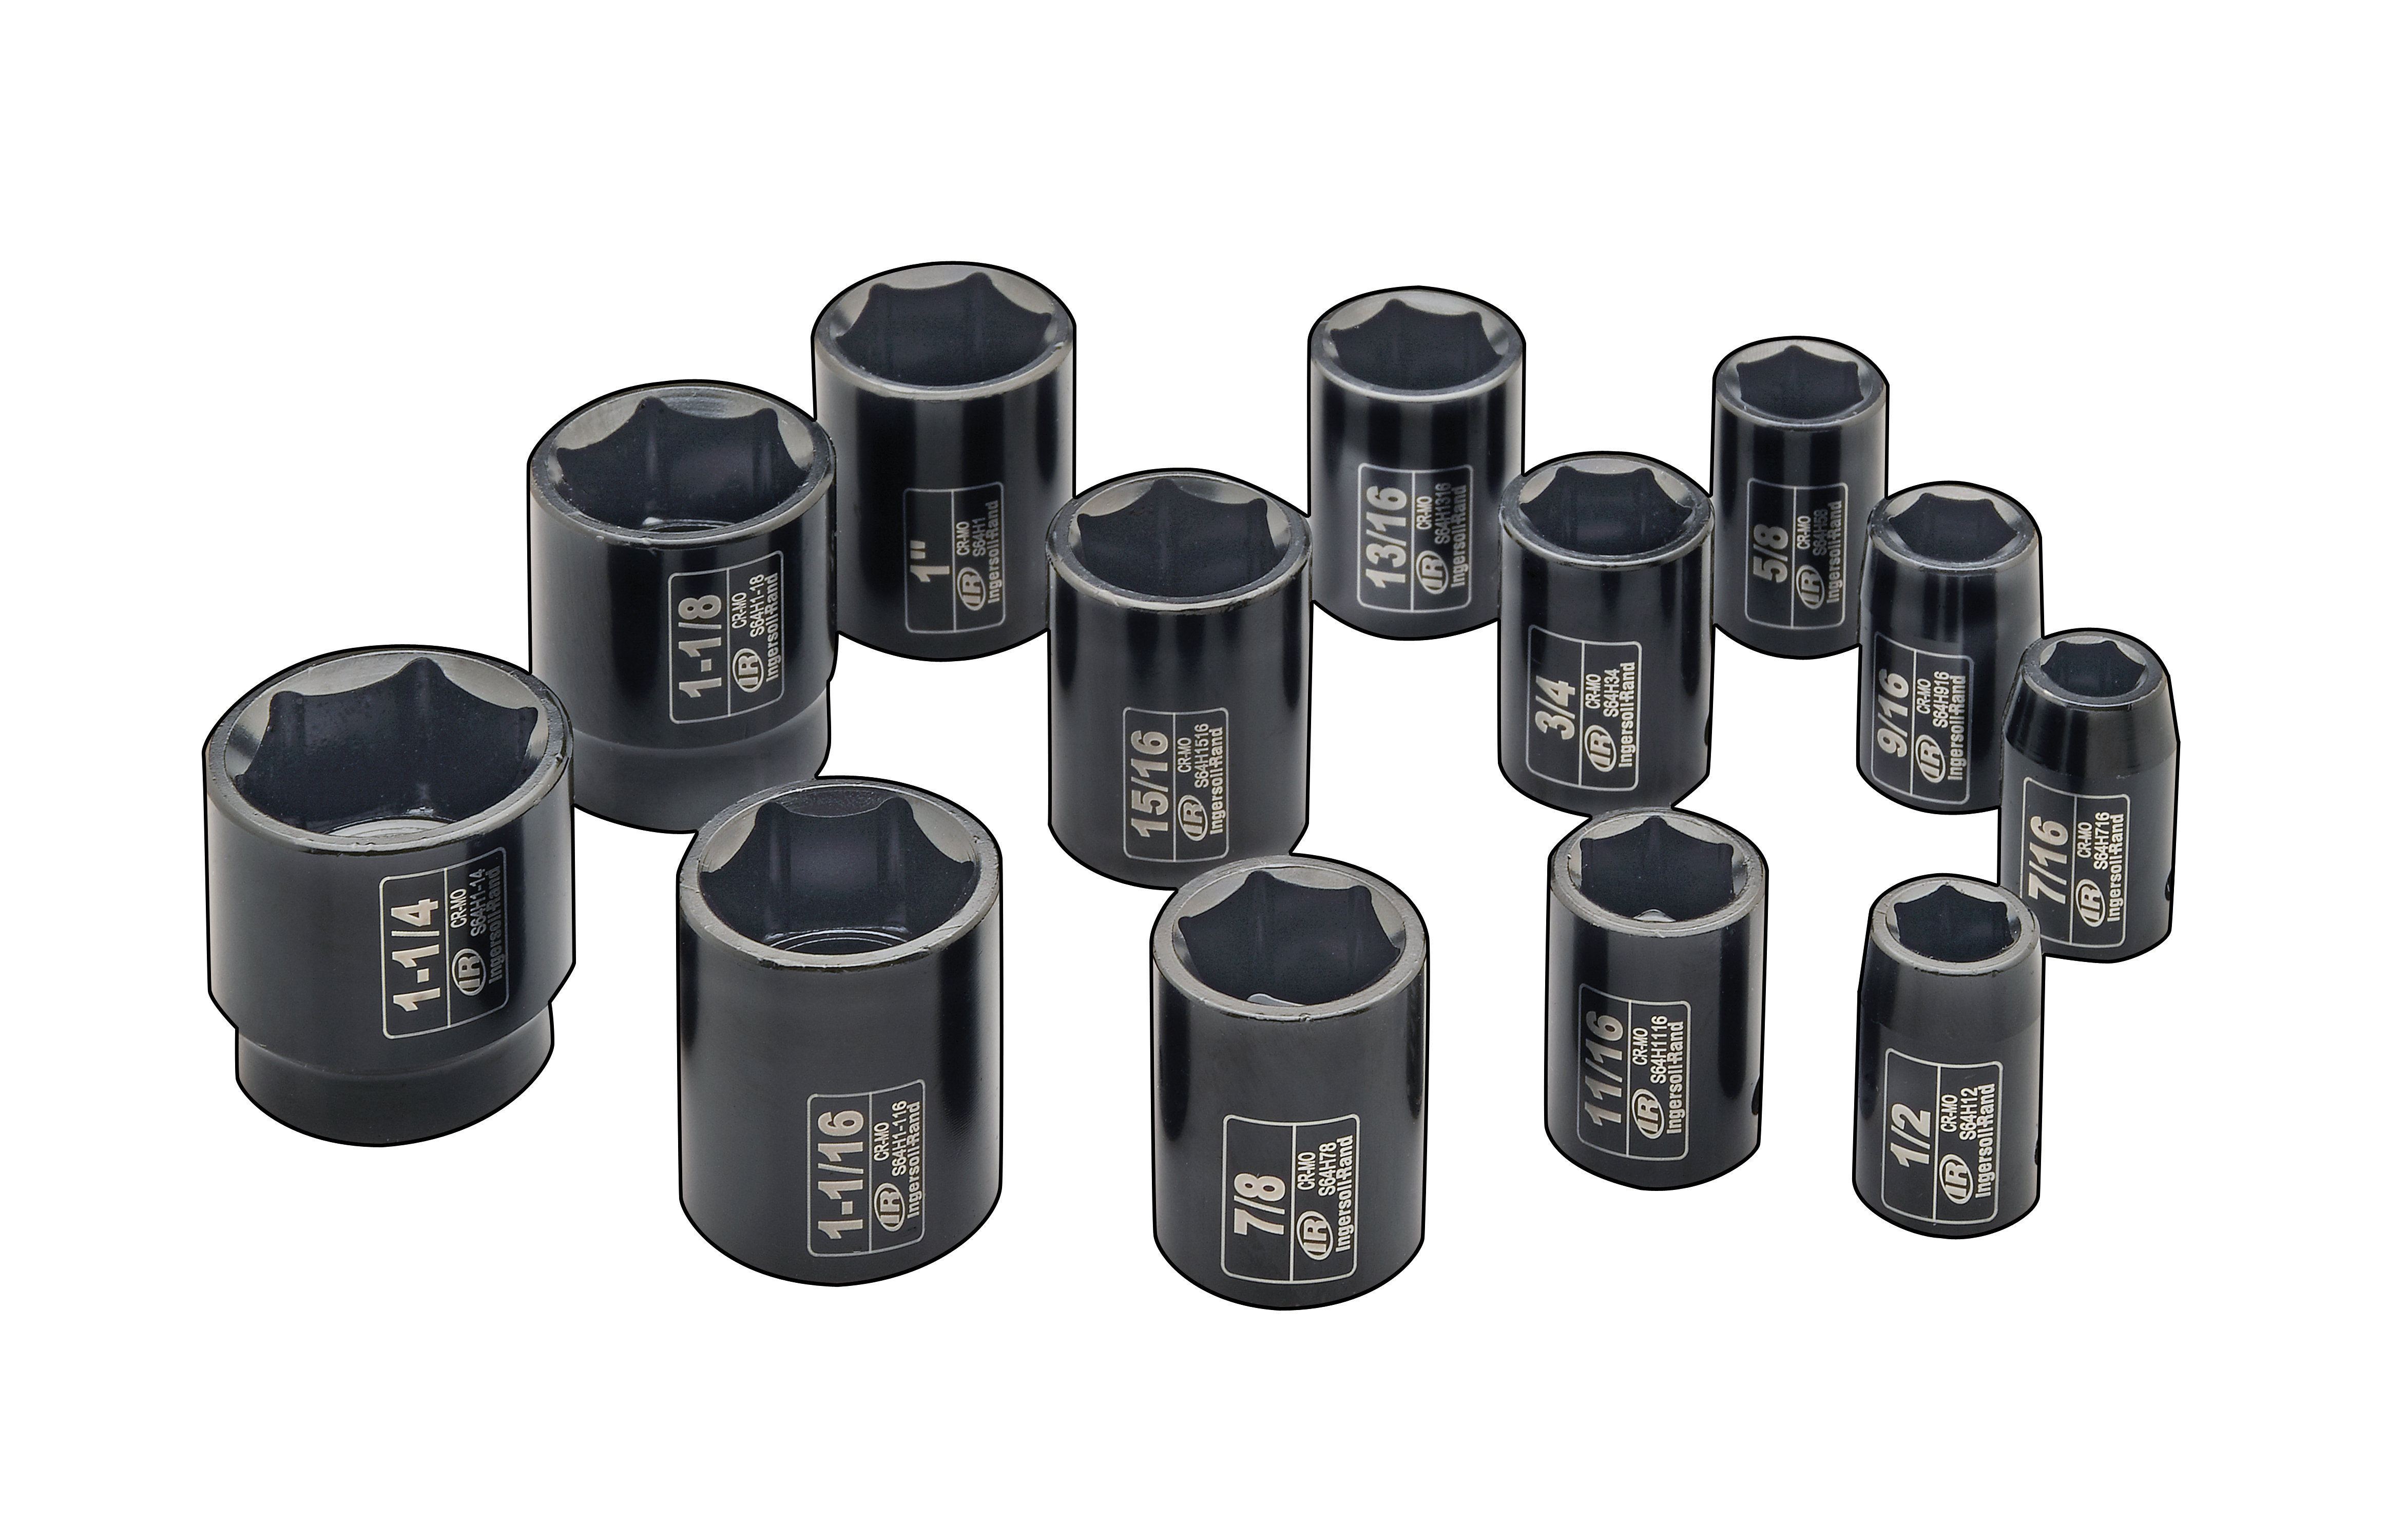 Amazon Com Ingersoll Rand Sk4h13 1 2 Inch Drive 13 Piece Sae Standard Impact Socket Set Home Improvement